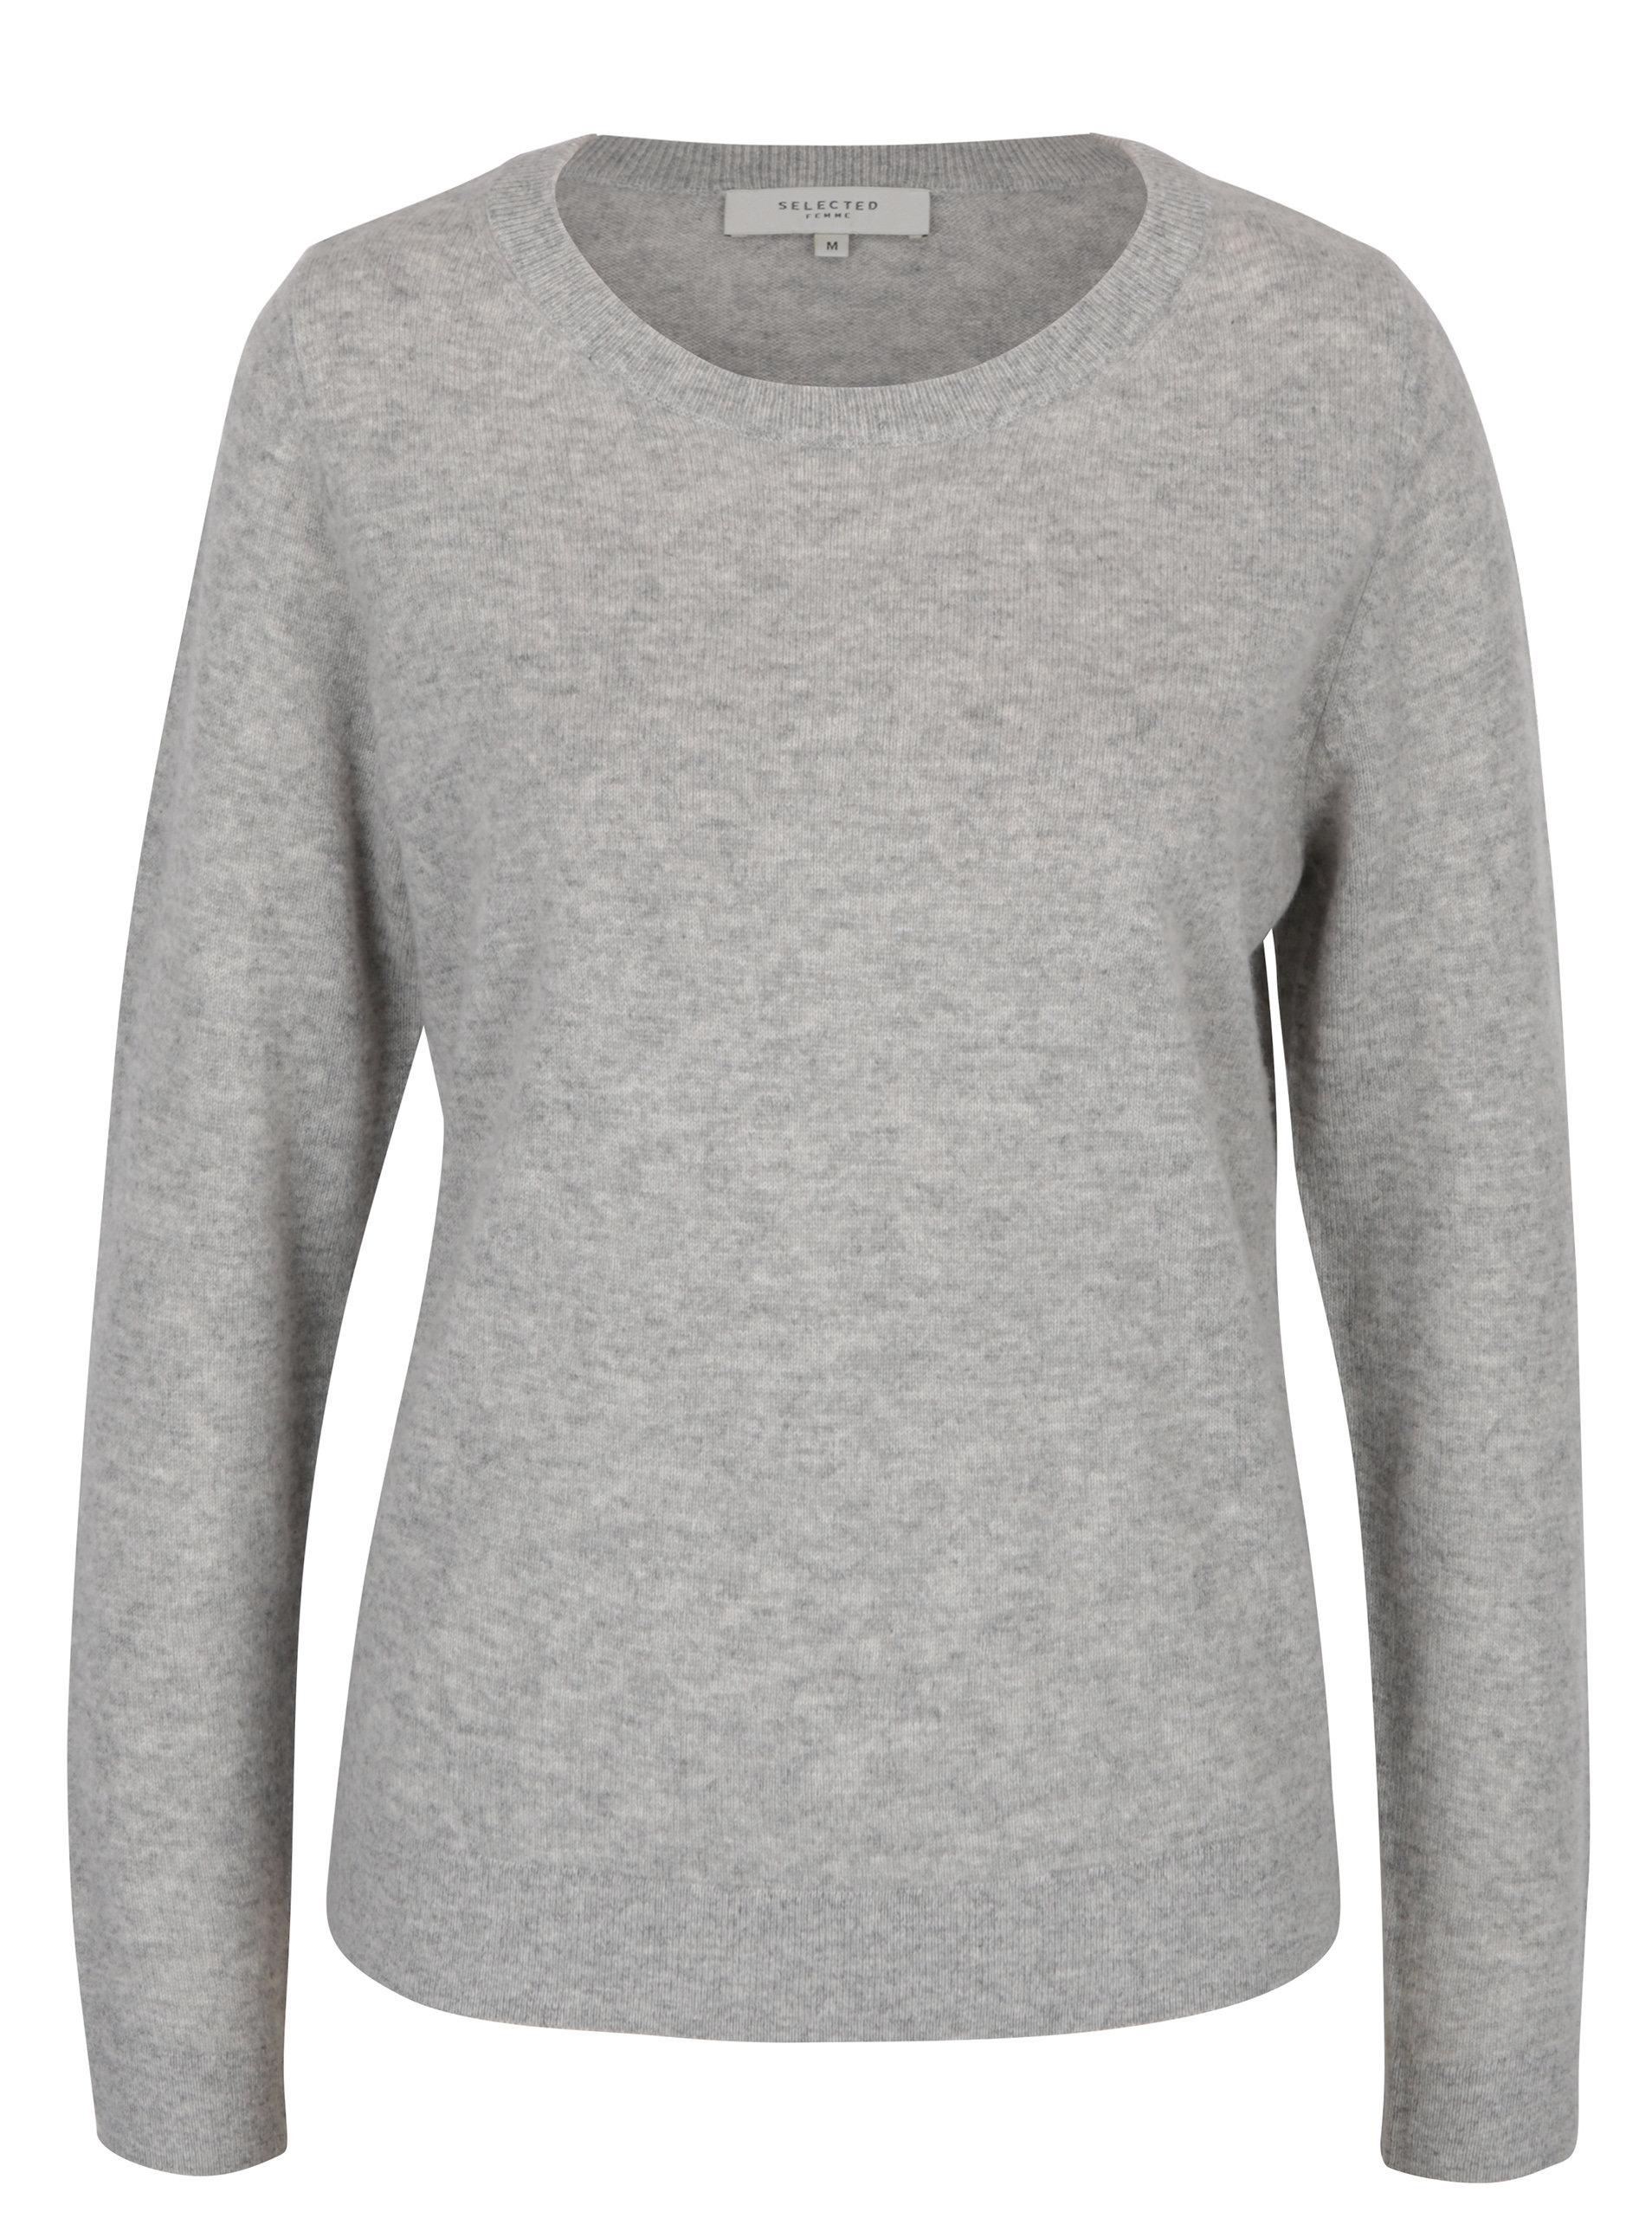 Šedý kašmírový svetr Selected Femme Aya ... c080ef74d8